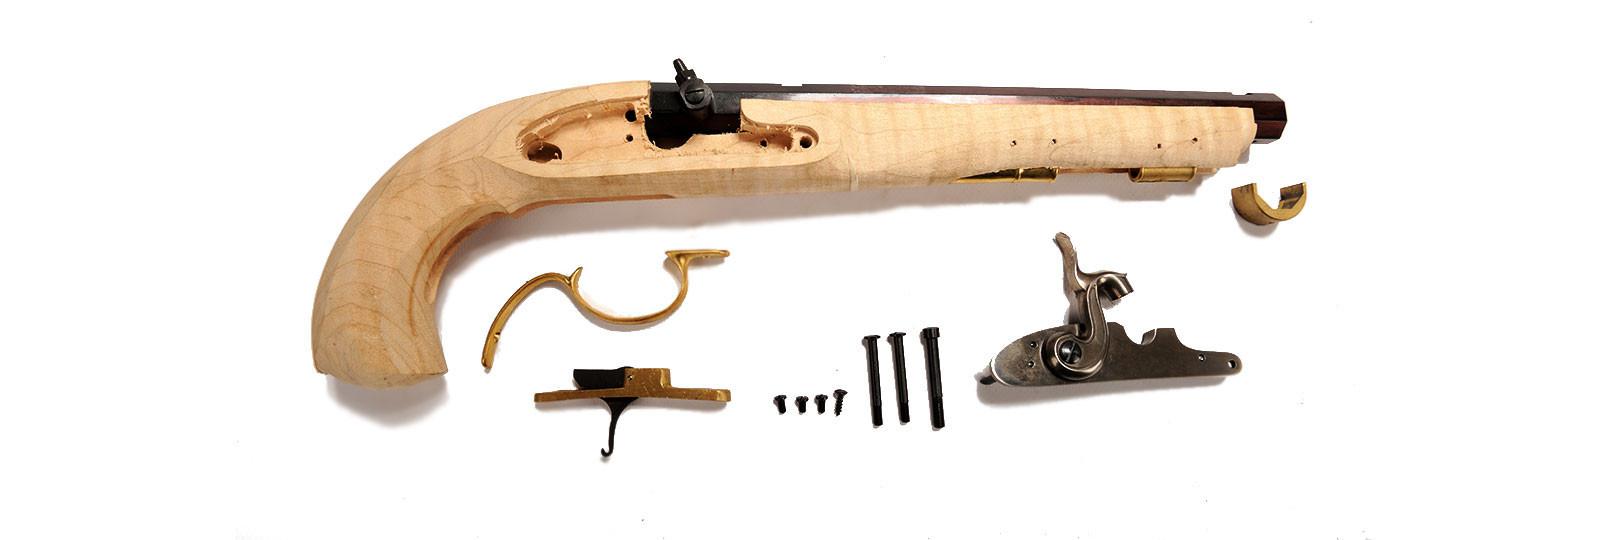 "Kentucky ""maple"" percussion model pistol kit"